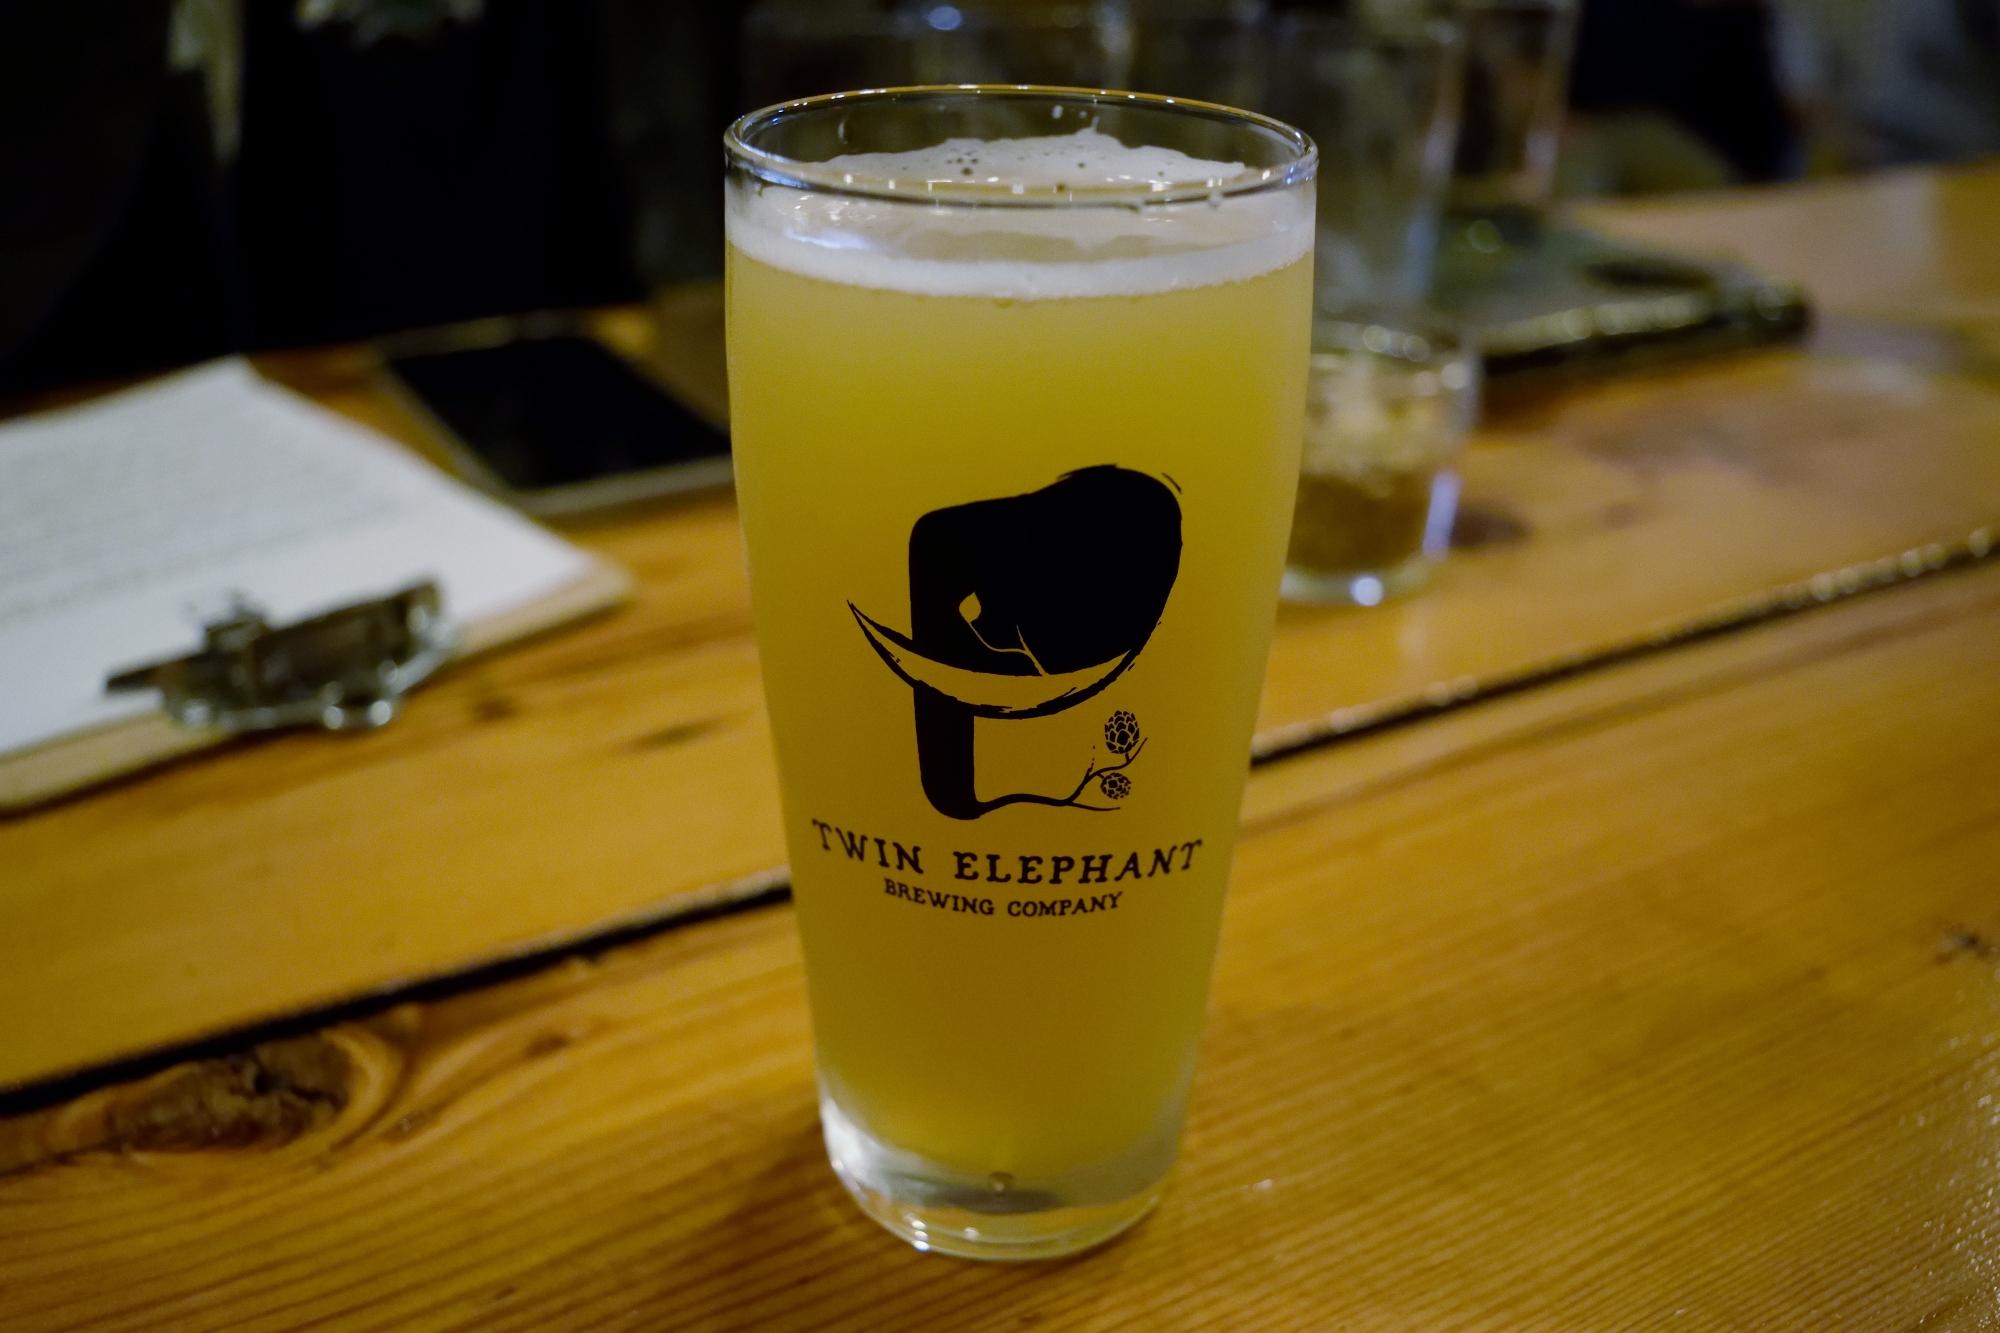 Sleek design, elegant glass, delicious beer - please stick around, Lil Shimmy Ye!